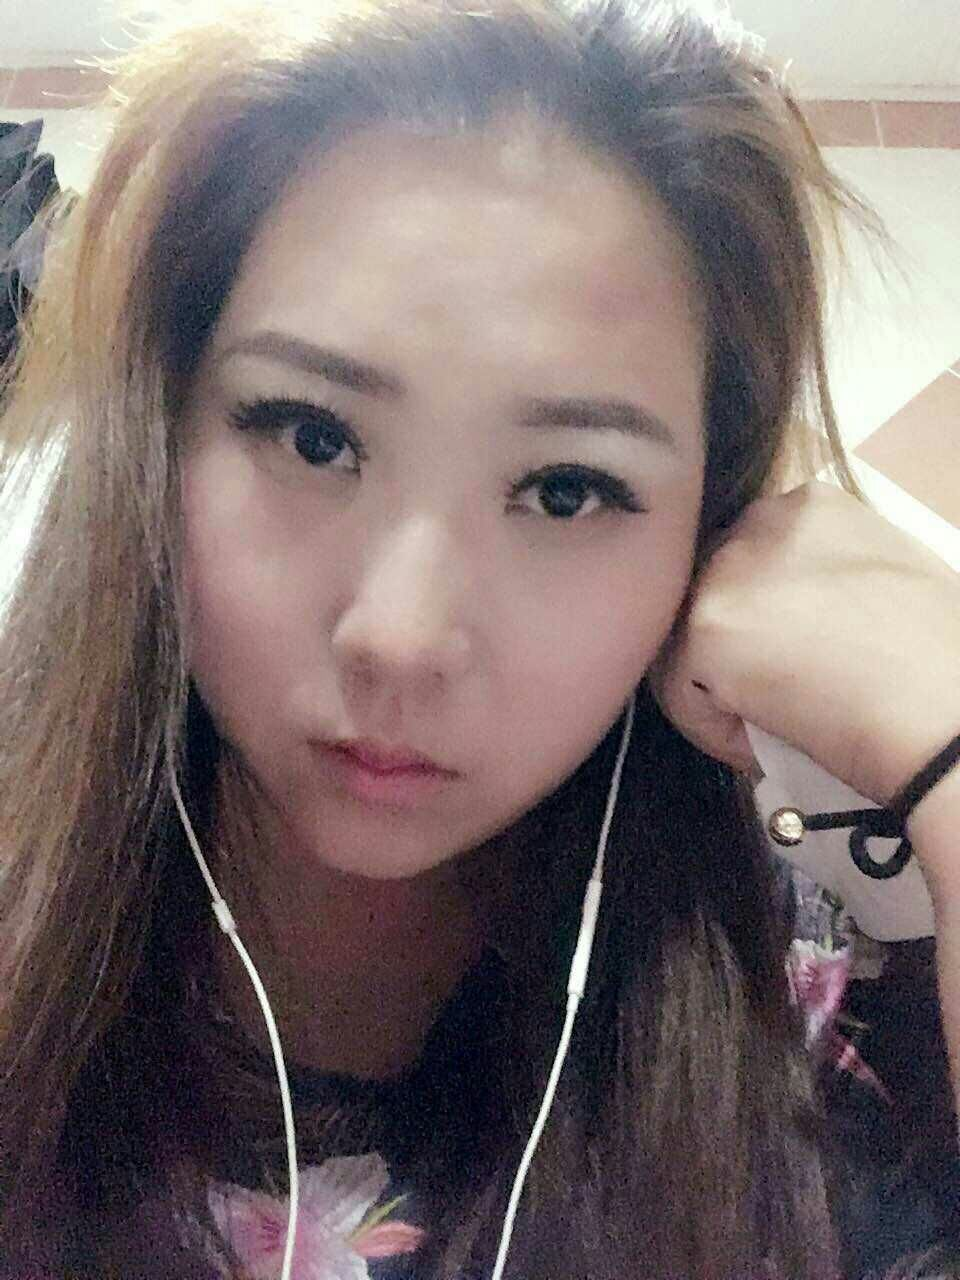 Alice, nordkoreansk escort i Al Manama 4-6050